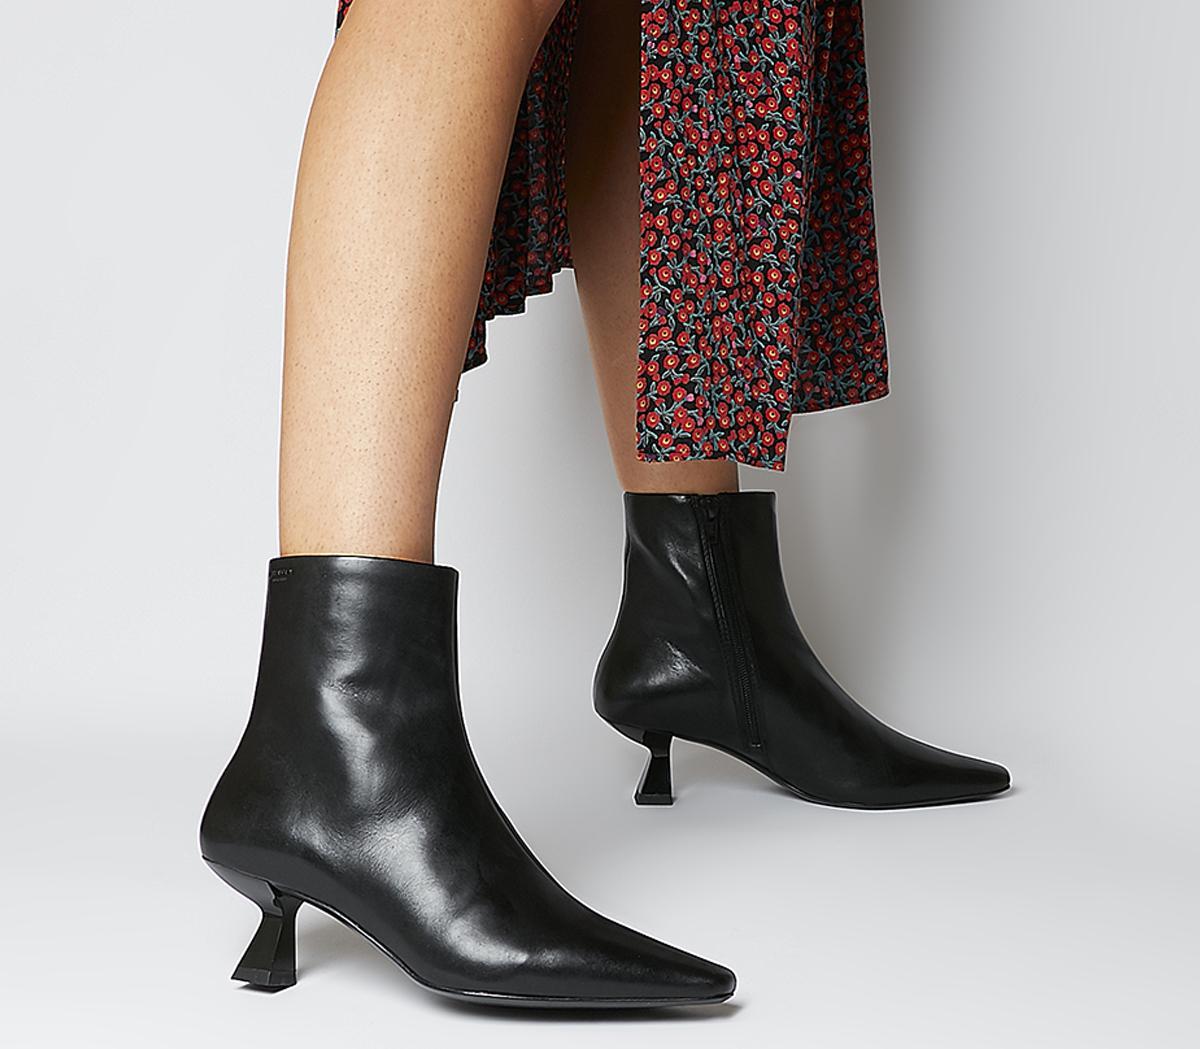 Vagabond Lissie Ankle Boots